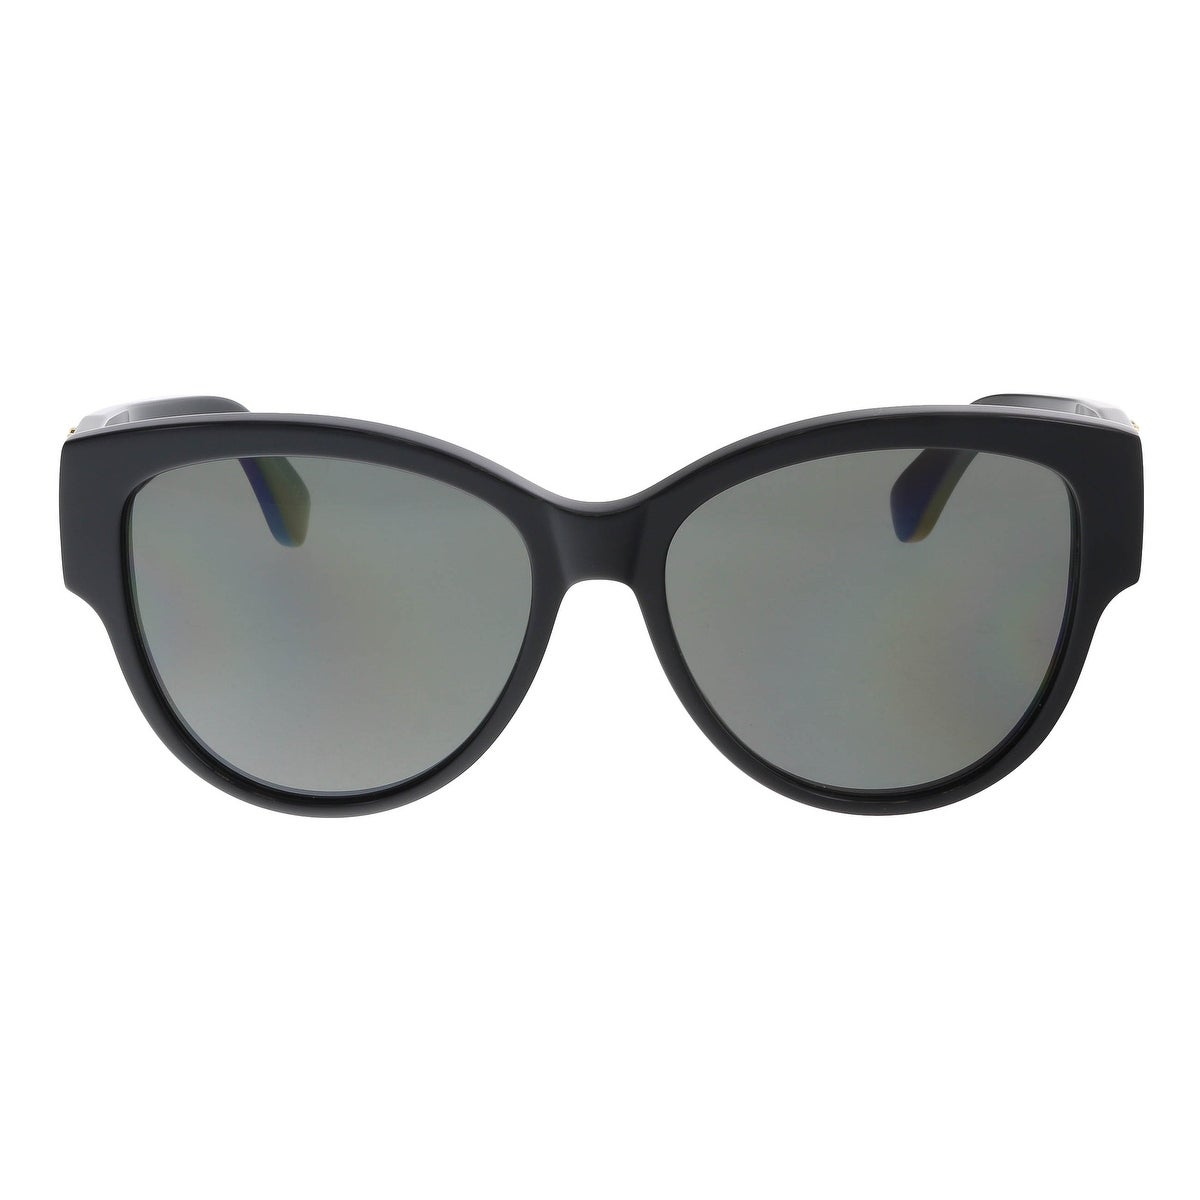 a454d58620cd1 Shop Saint Laurent SL M3-002 Black Cat Eye Sunglasses - 55-16-140 - Free  Shipping Today - Overstock - 16693314